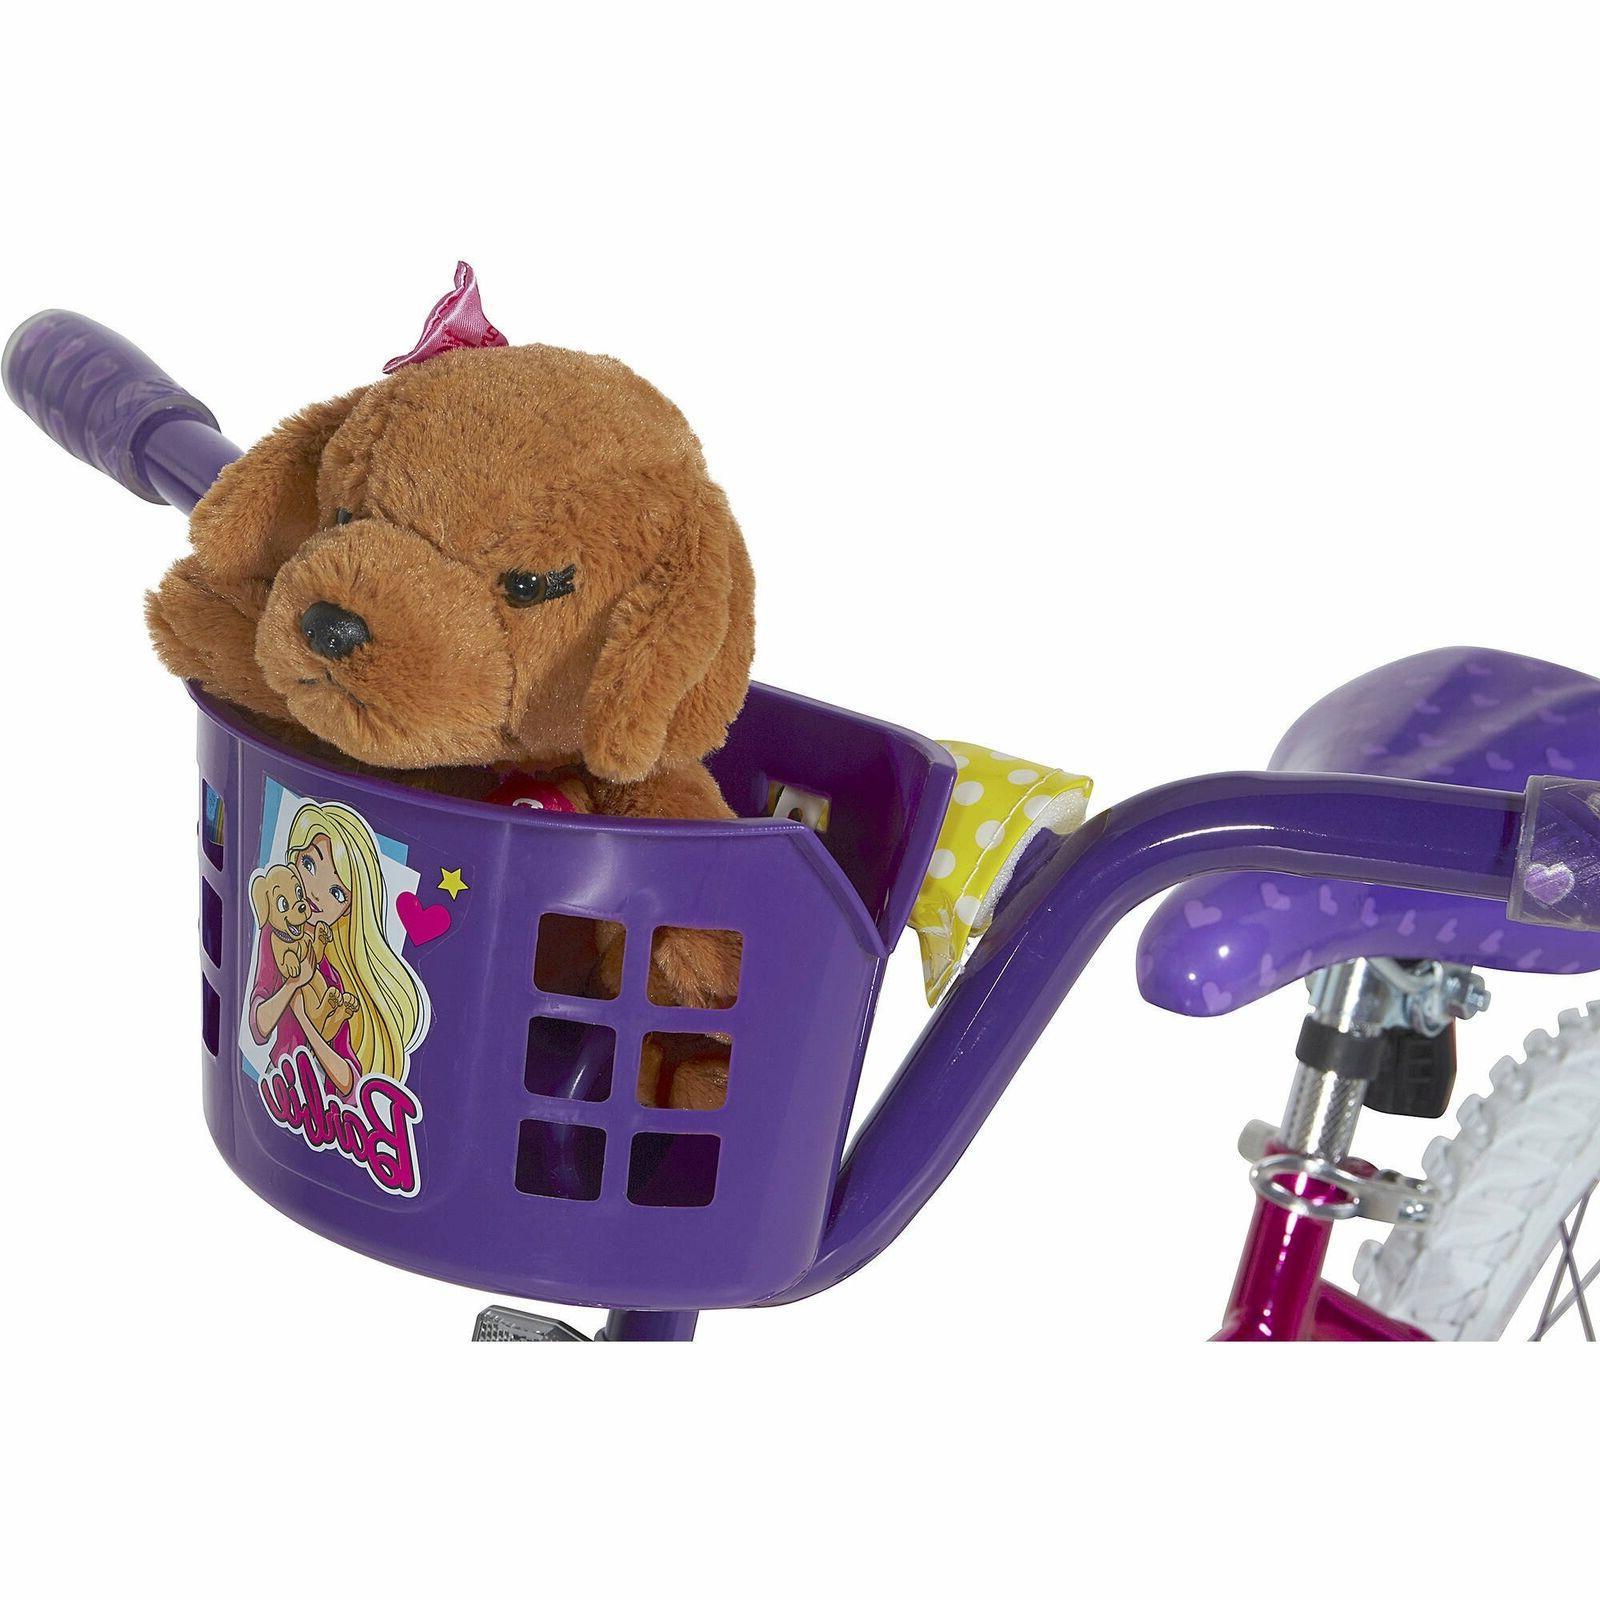 "Dynacraft Barbie 16"" Girls' Bike Learning Bicycle with Baske"